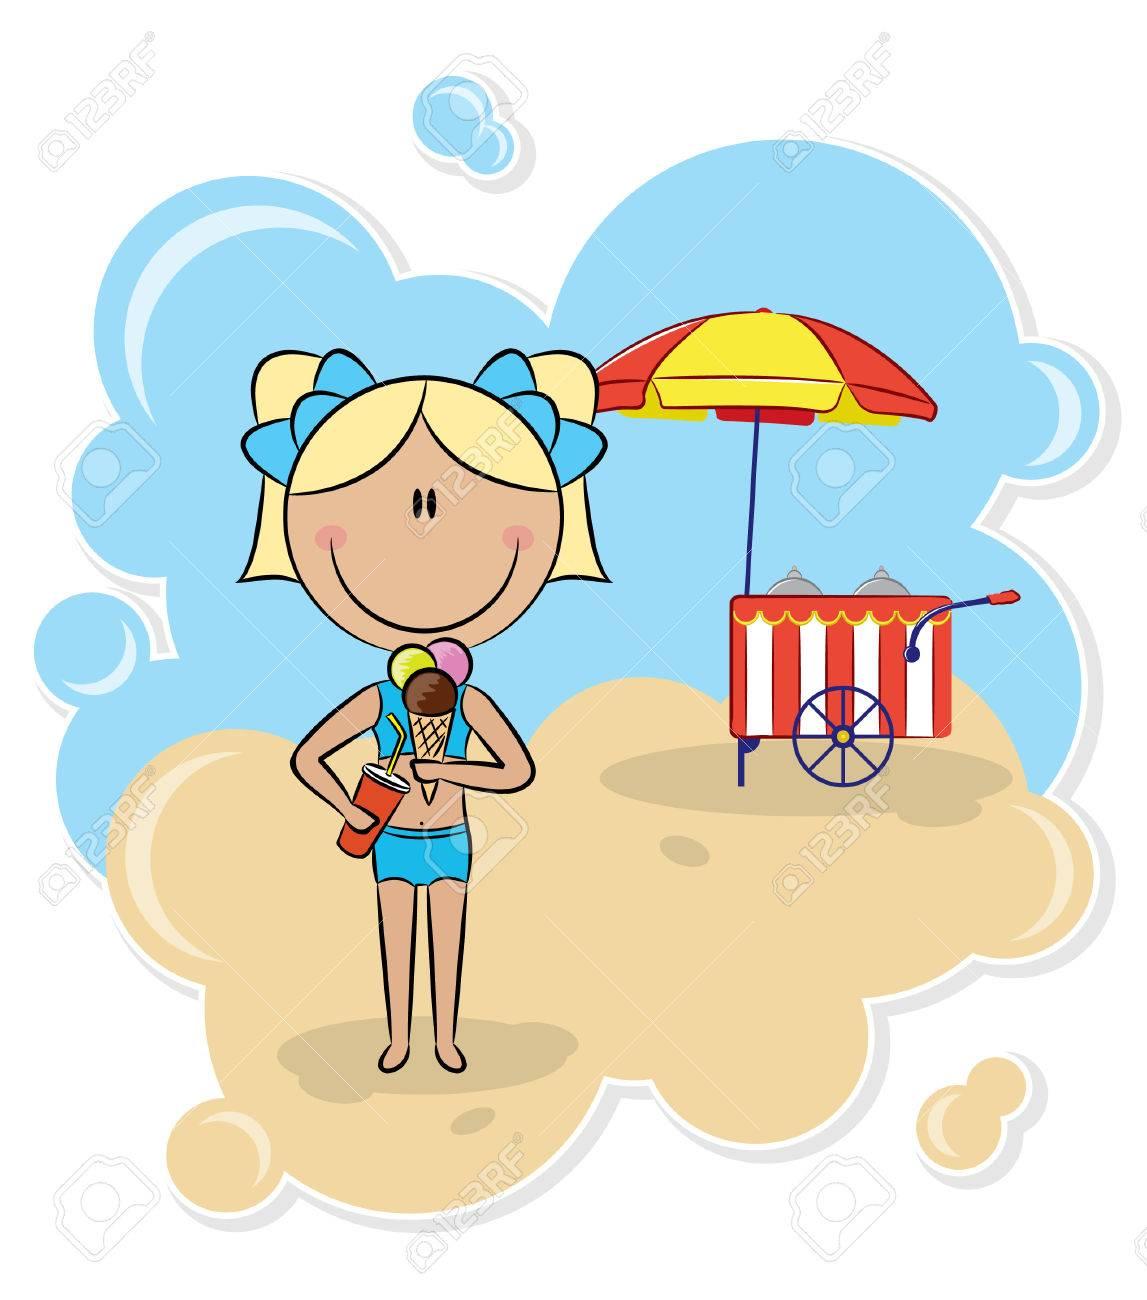 Cheerful girl with ice-cream on the beach Stock Vector - 7255851